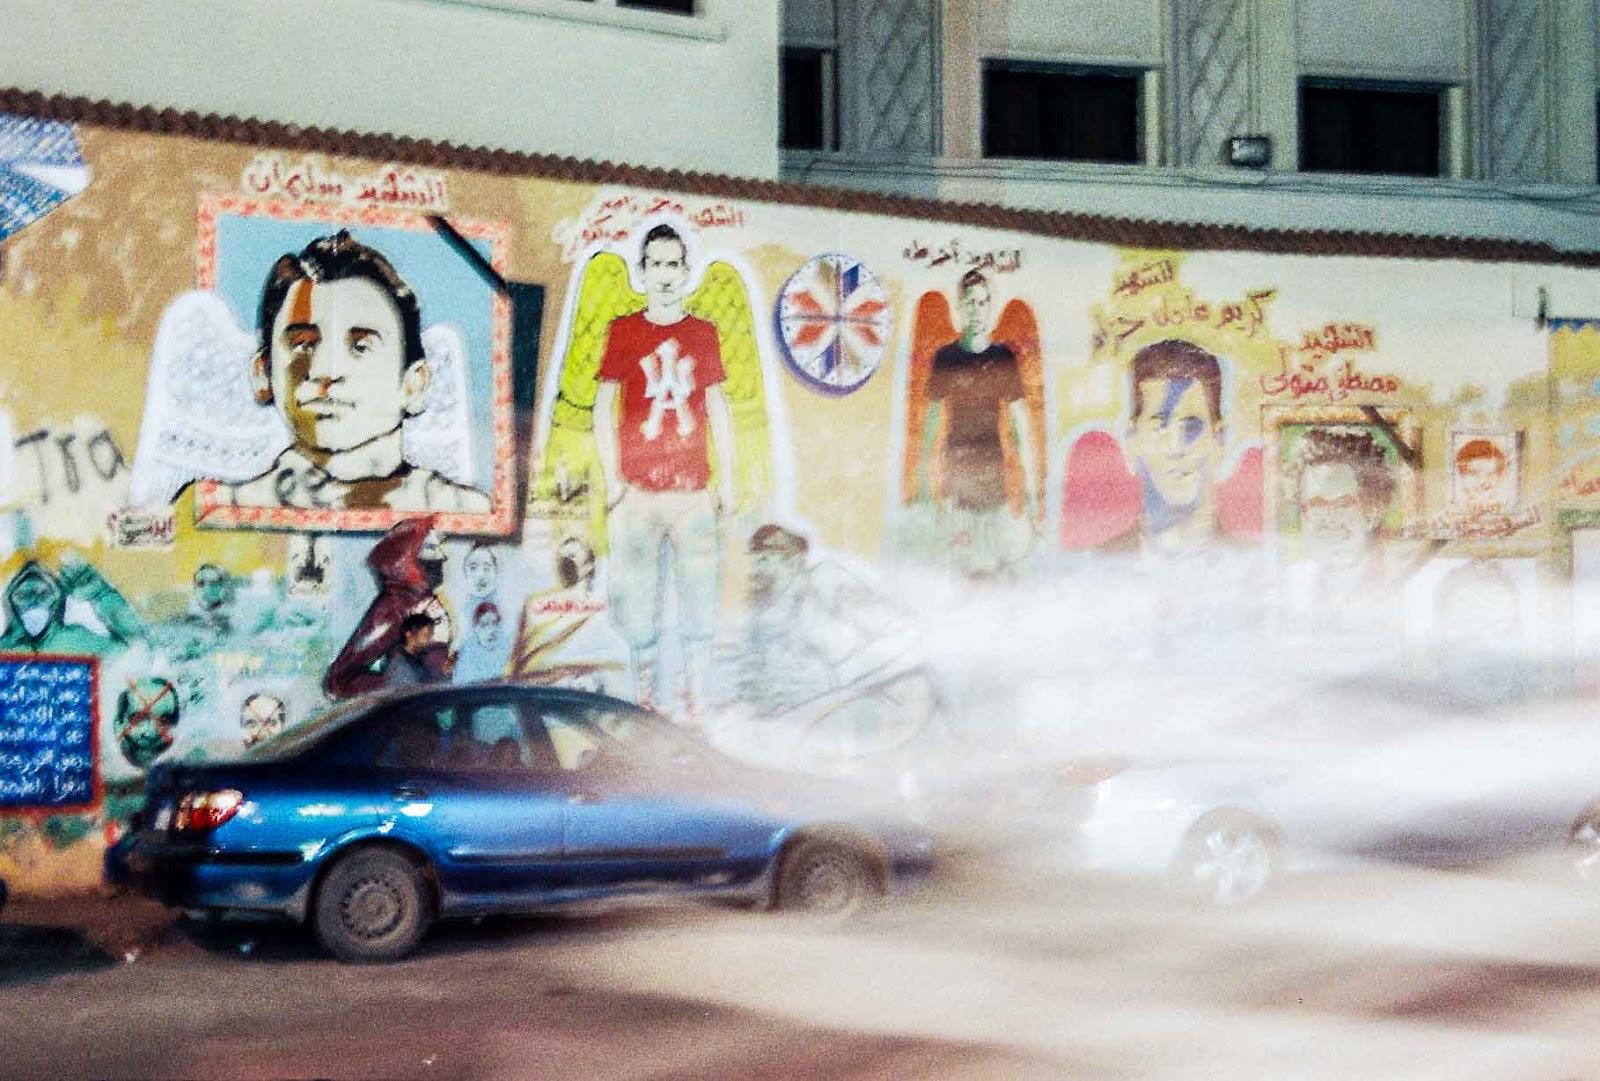 nadia_mounier_photography_analogue_egypt_revolution_graffiti.jpg